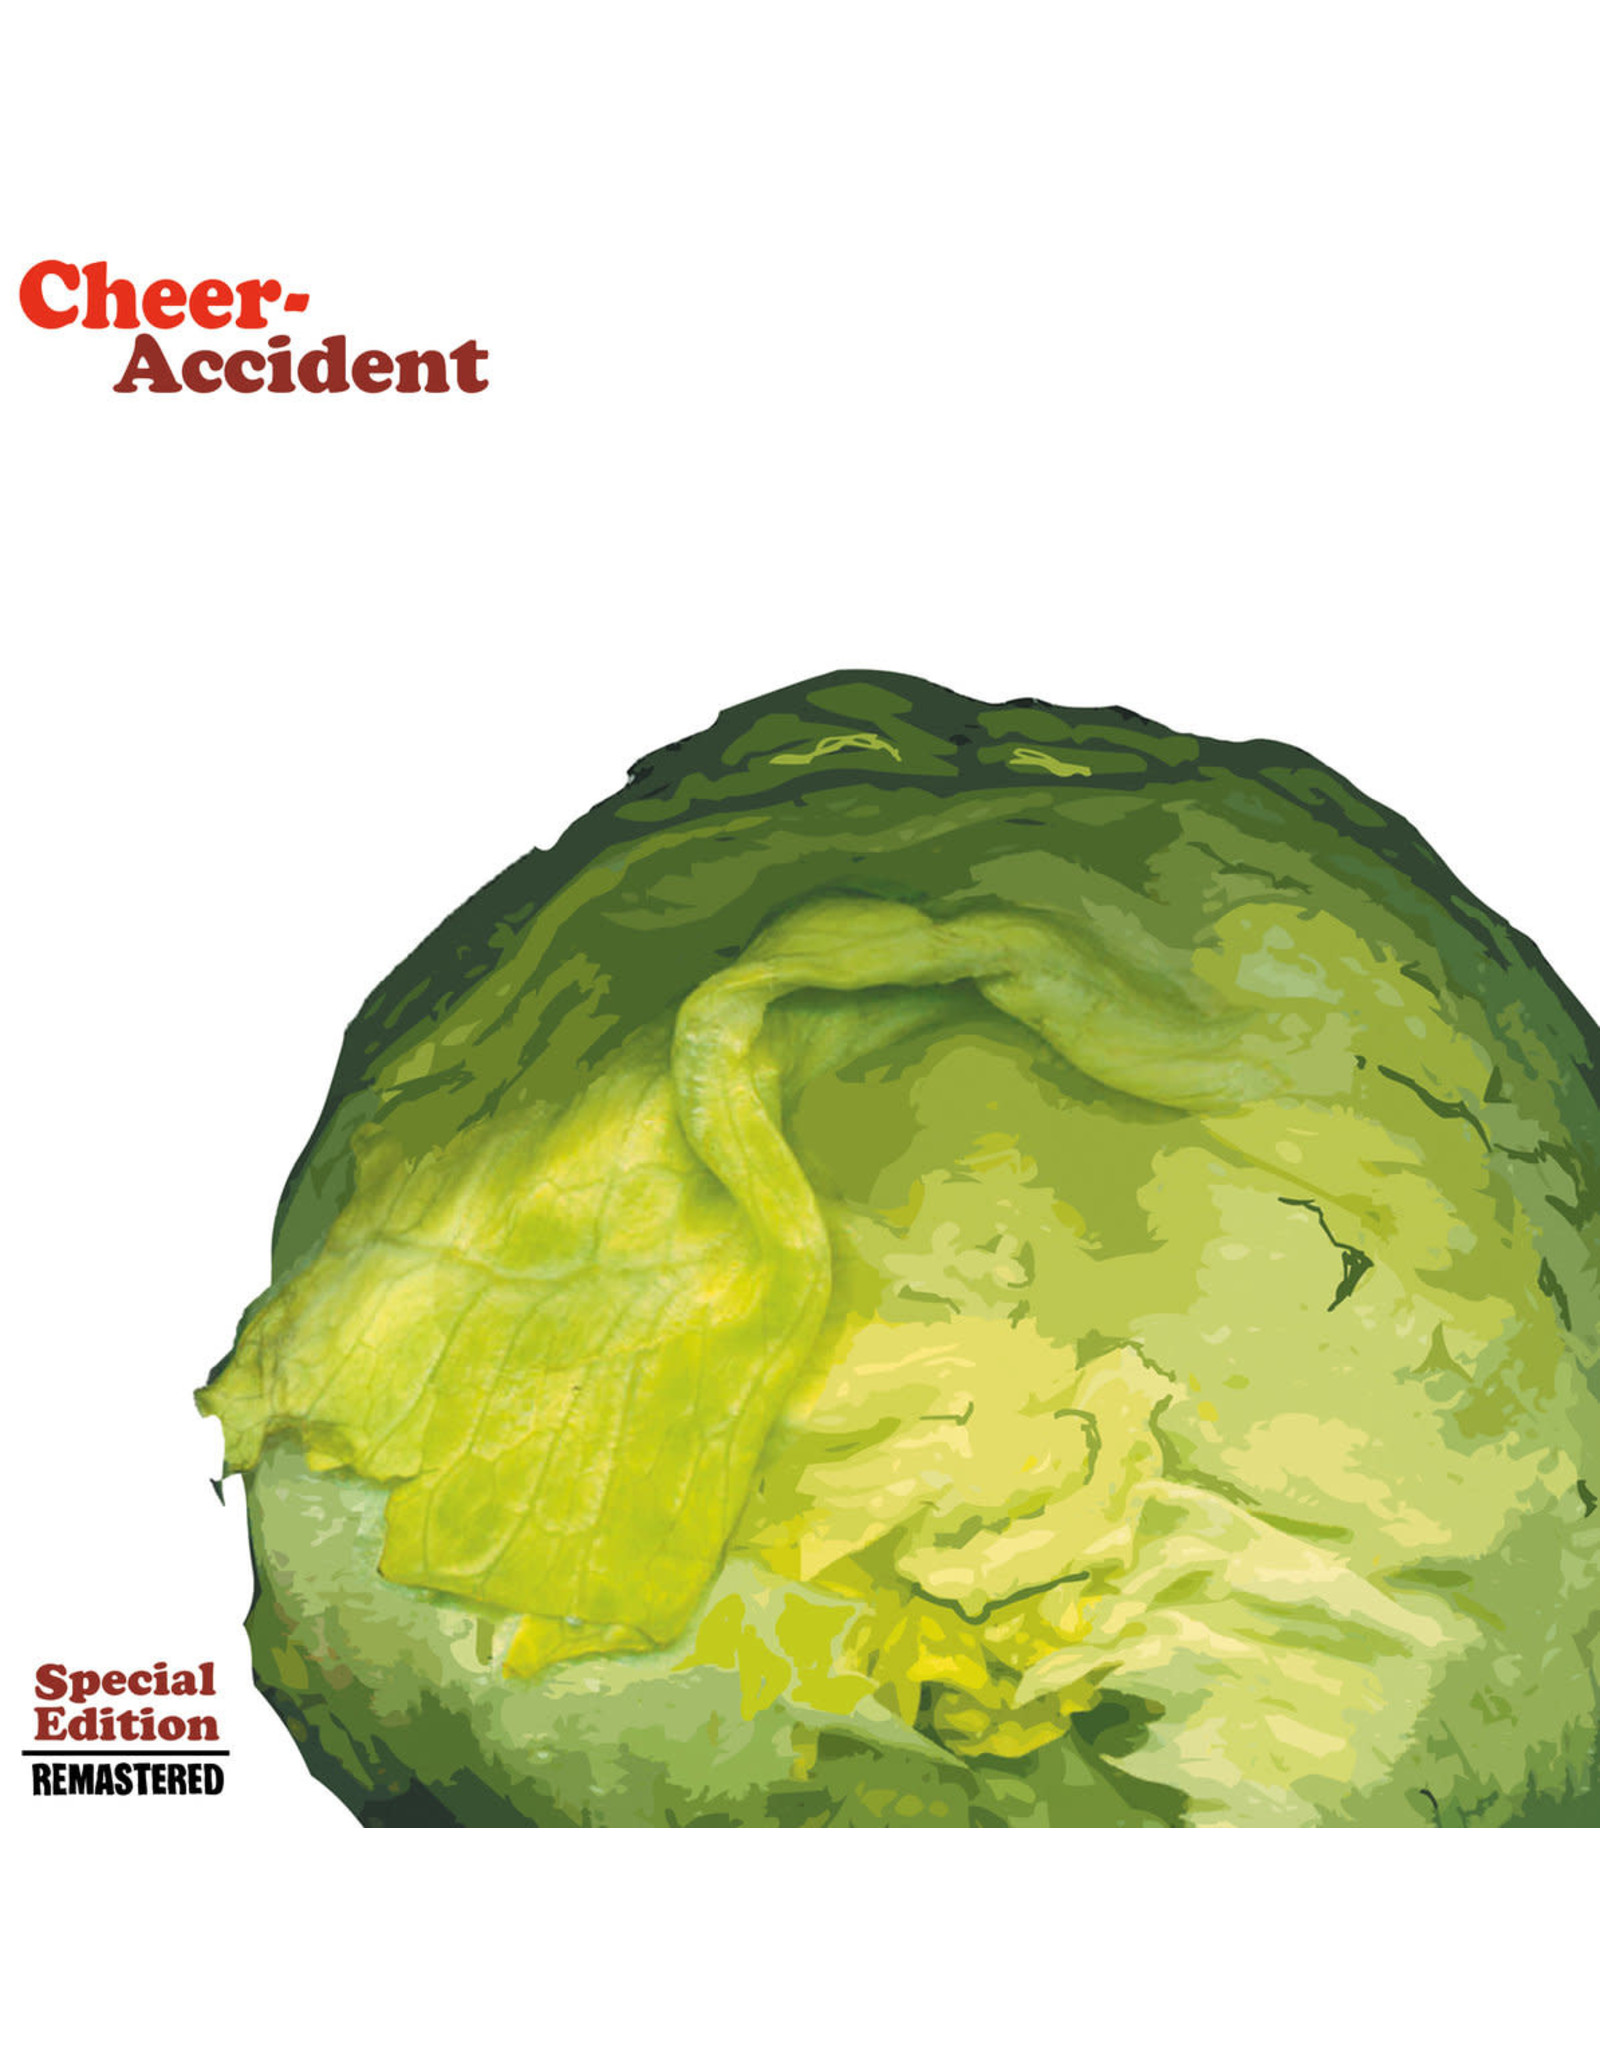 New Vinyl Cheer-Accident - Salad Days: Remastered LP